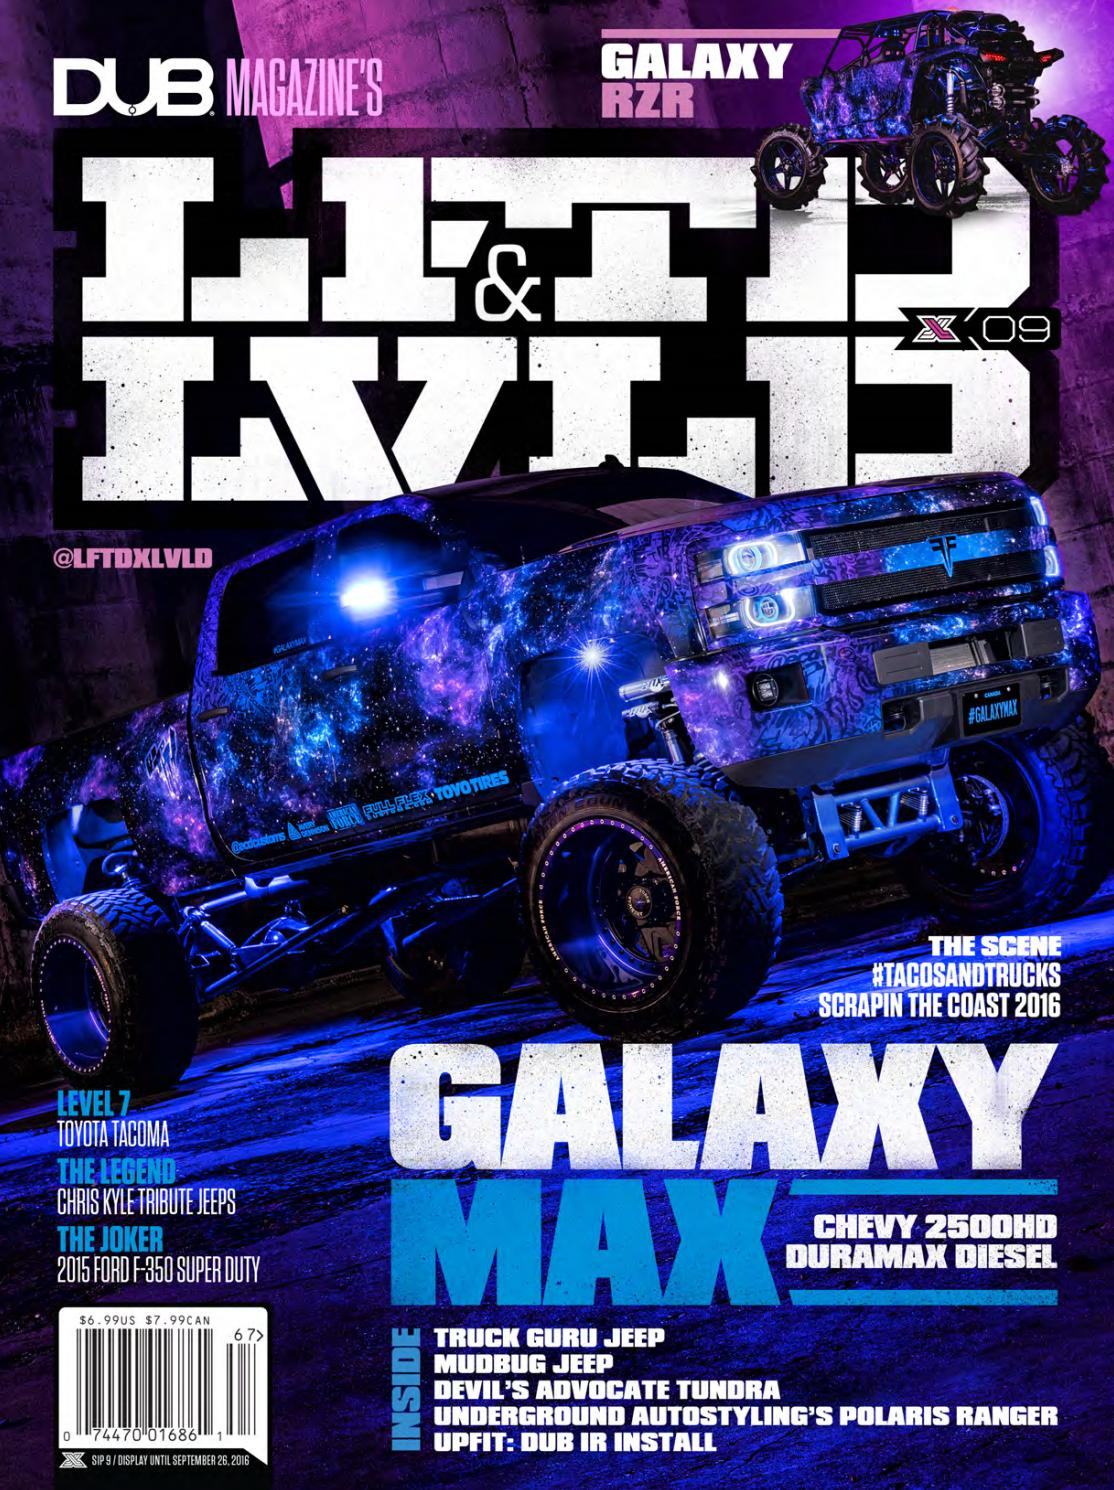 Dub Magazines Lftdlvld Issue 3 By Issuu Mb Quart Na13204 Mbquart 4x80watt Compact Powersports Amp 9